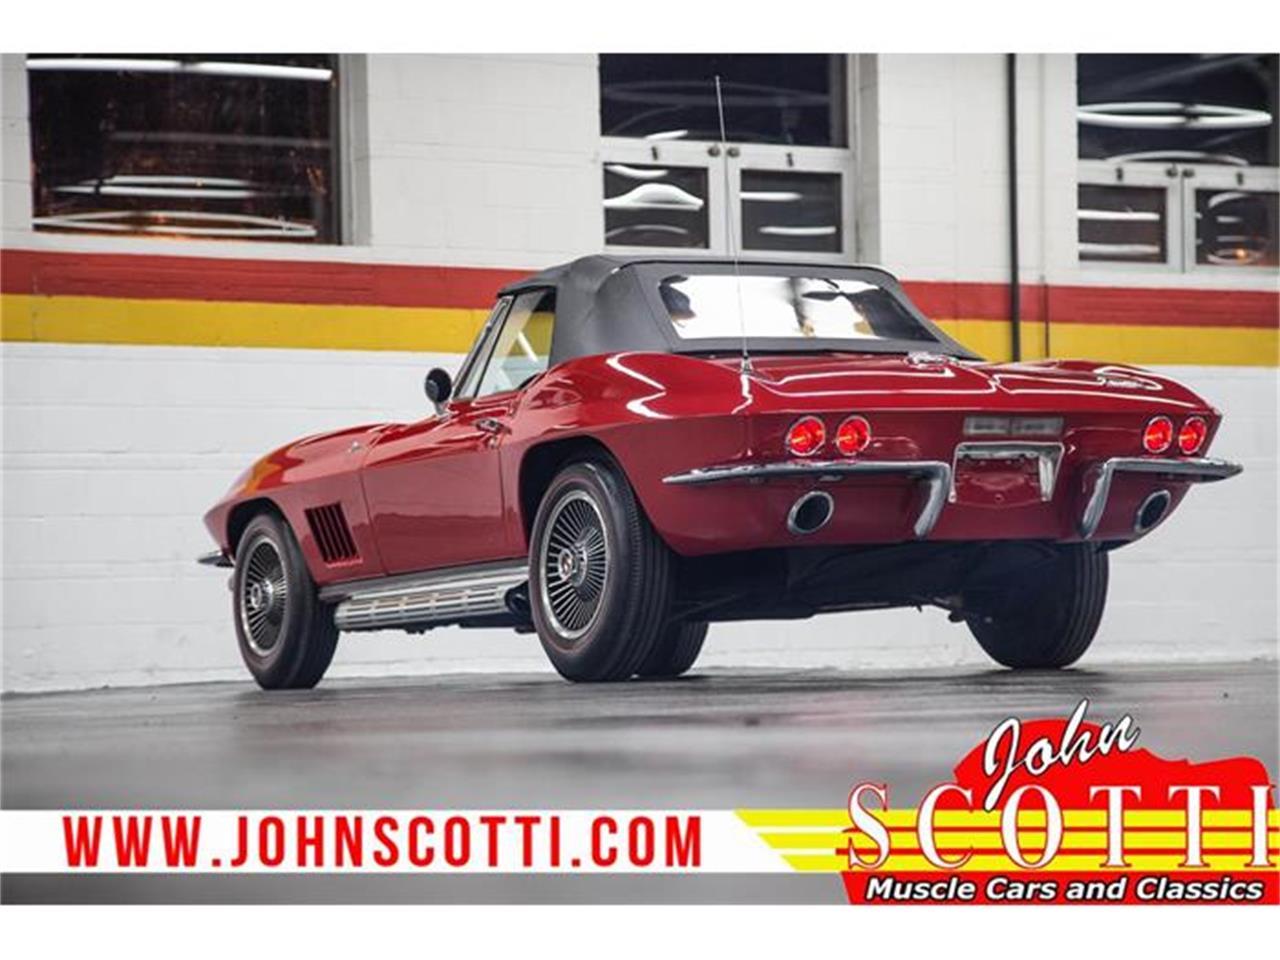 Large Picture of '67 Chevrolet Corvette - $59,990.00 - GA0F